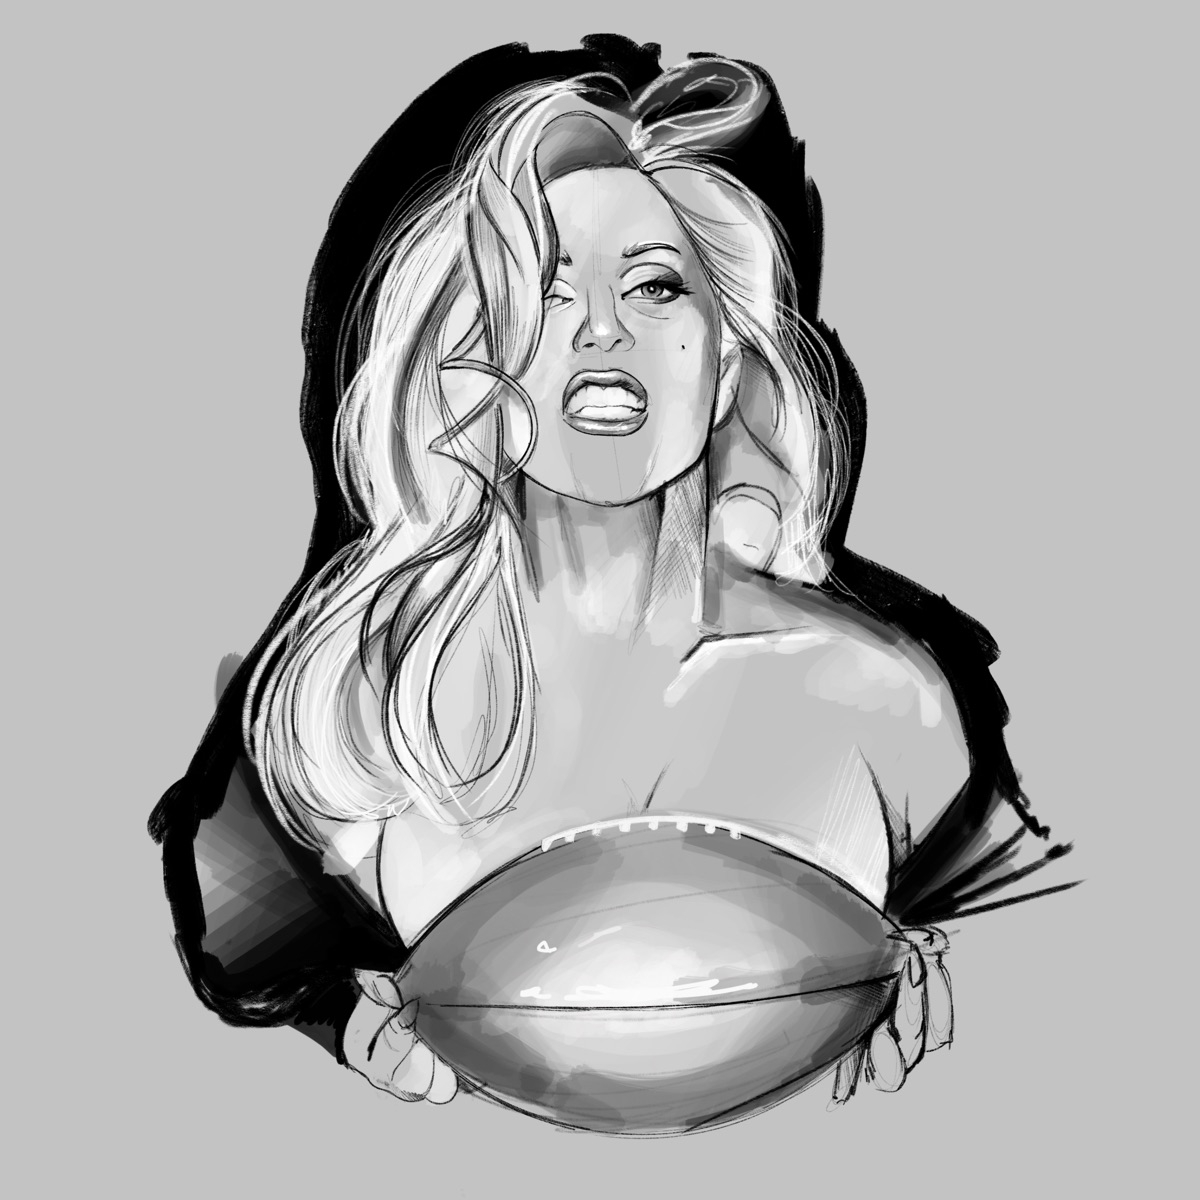 good luck Gaga Illustration lad - fmonroyr | ello